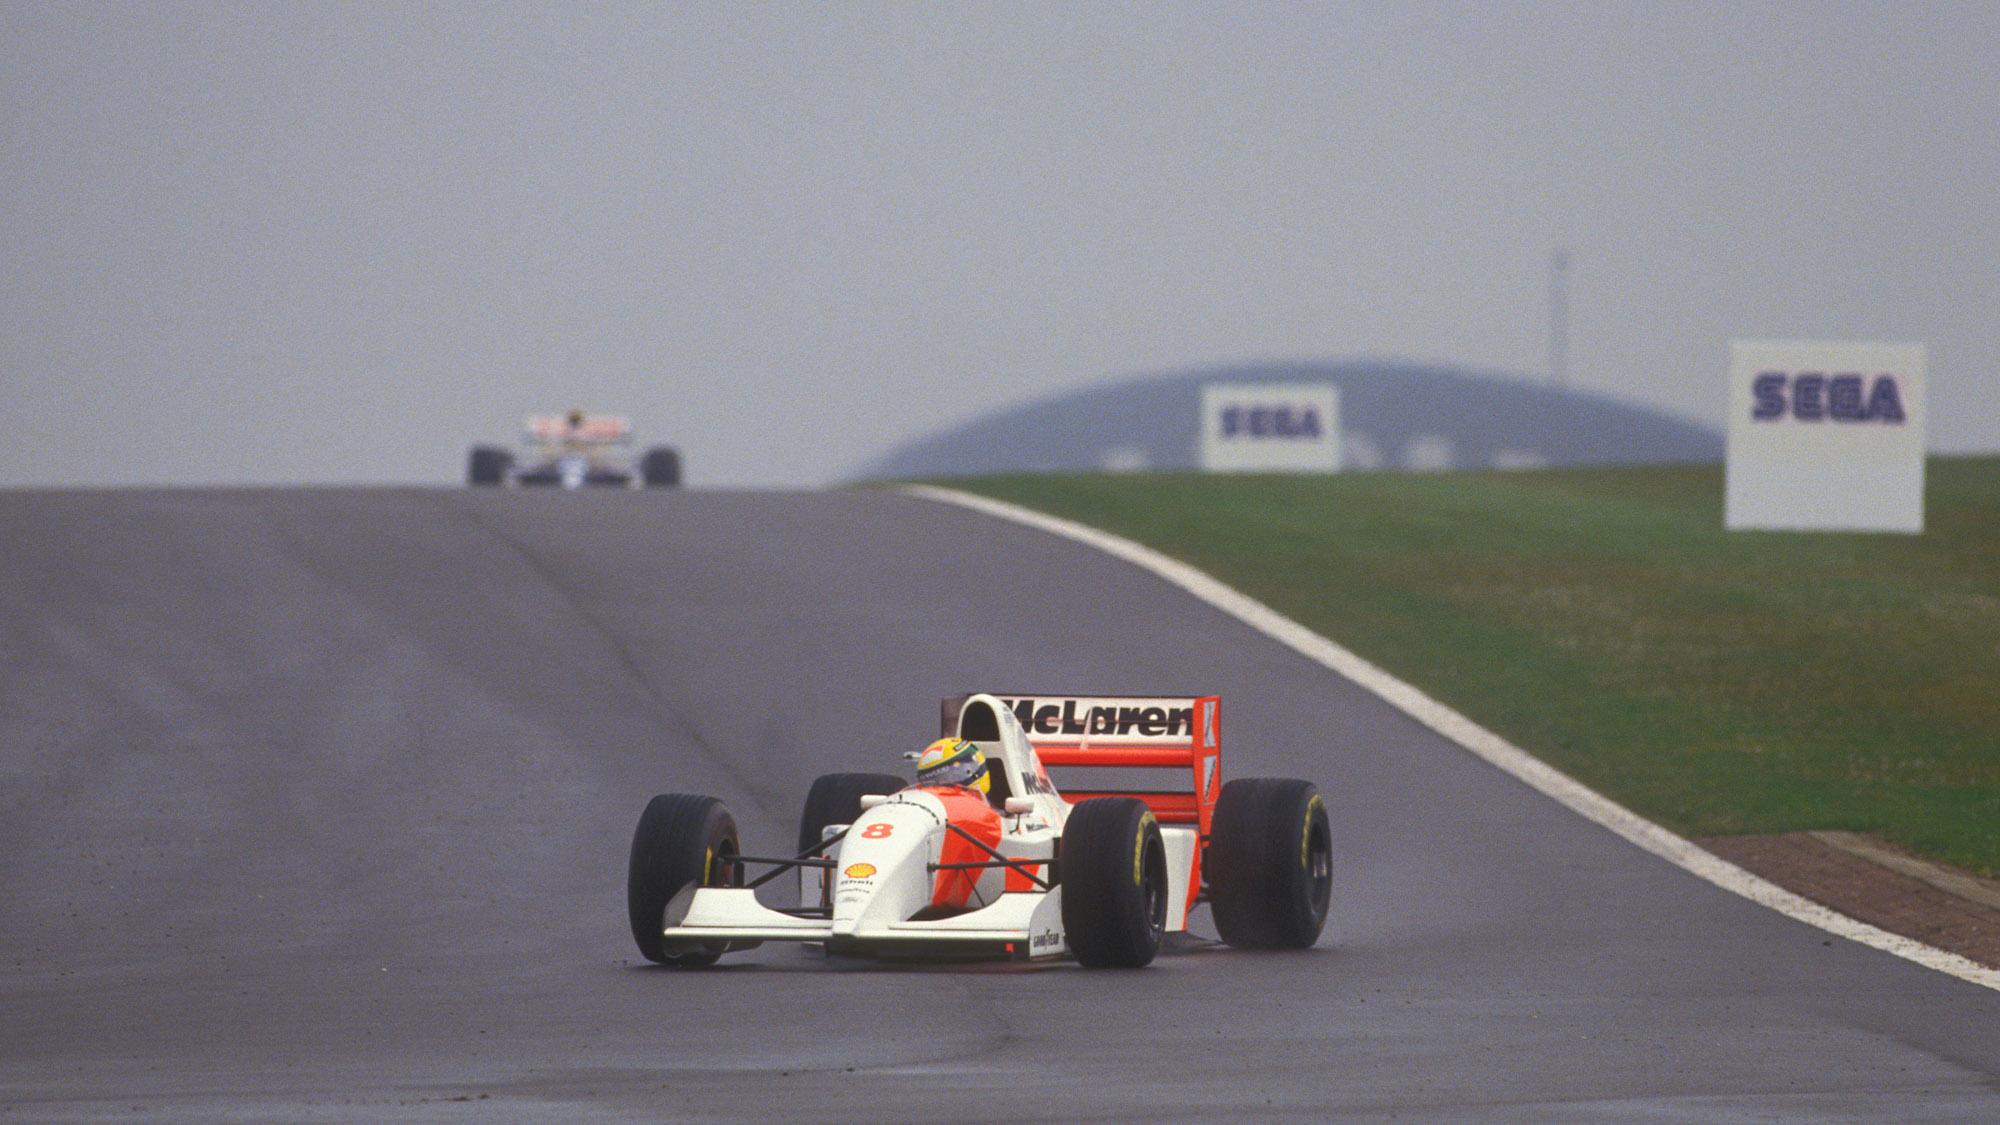 Ayrton Senna leads Alain Prost in the 1993 European Grand Prix at Donington